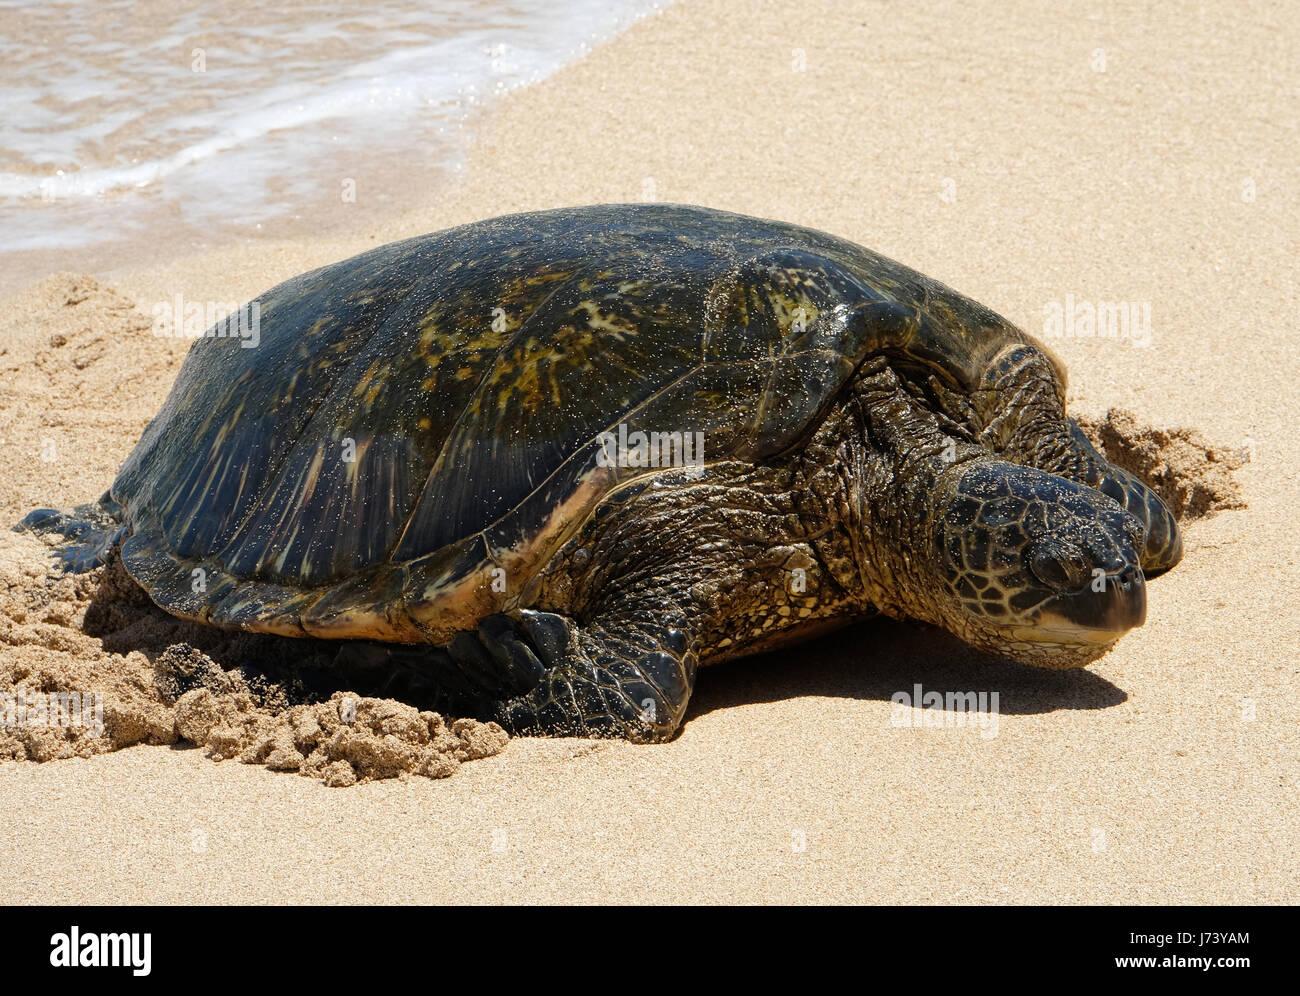 Green Sea Turtles (Chelonia mydas) resting on the beach at Ho'okipa Beach Park, Paia, Maui, Hawaii. Stock Photo